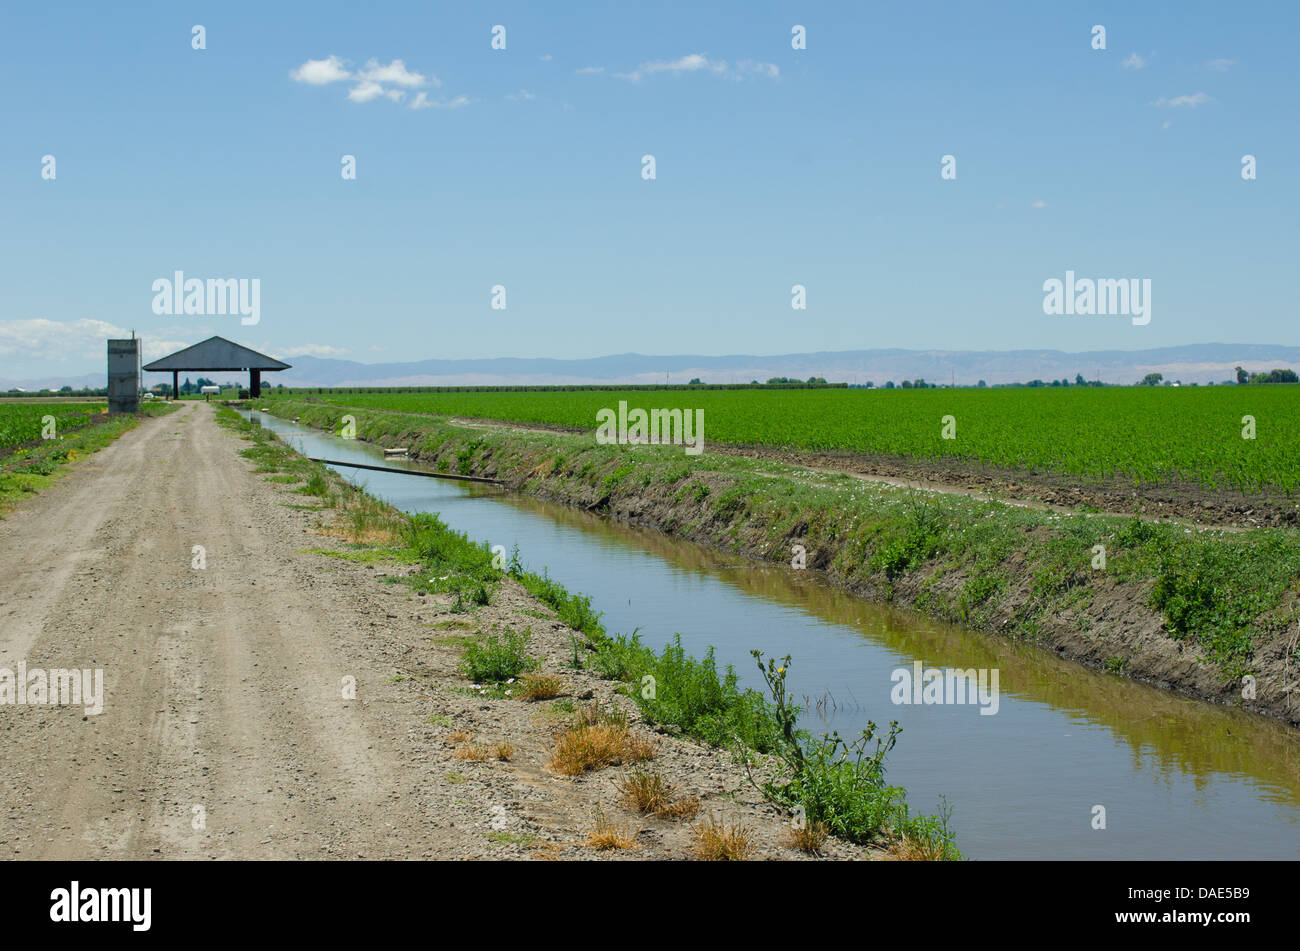 corn field, irrigation canal, California delta west of Stockton - Stock Image